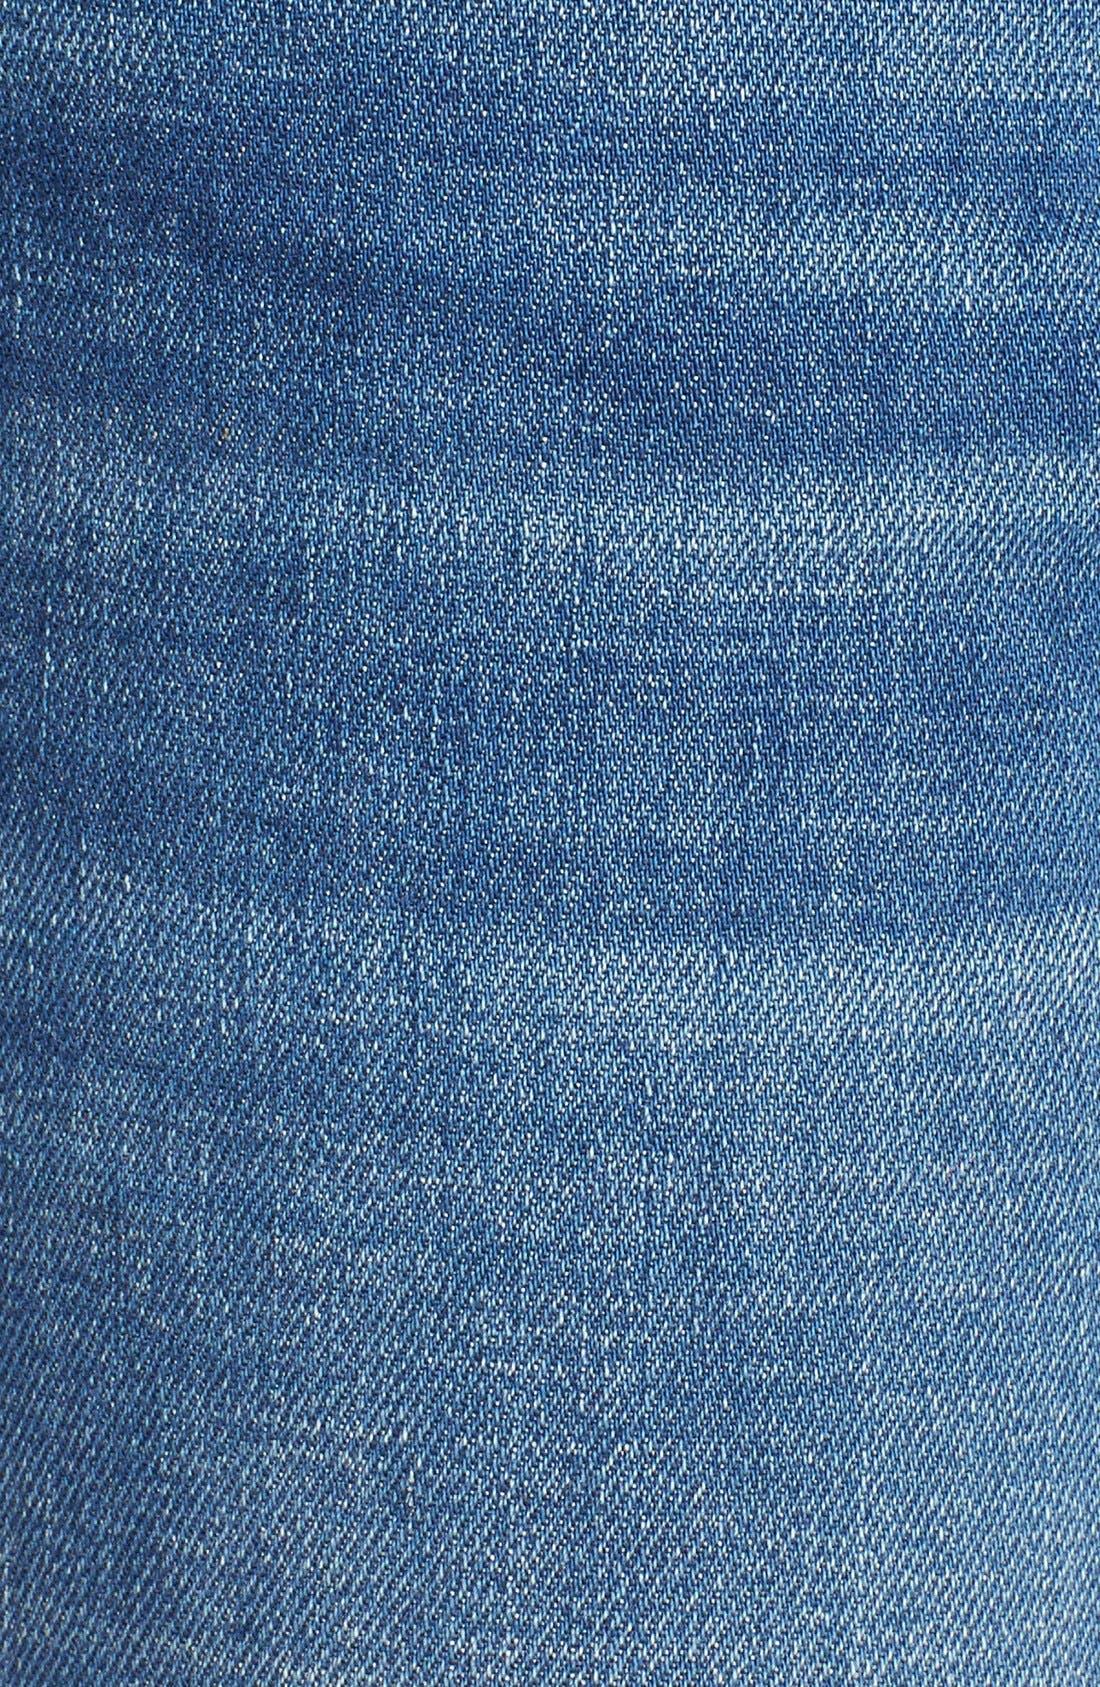 Alternate Image 5  - Vigoss 'Tomboy Thompson' Destructed Jeans (Medium Wash)